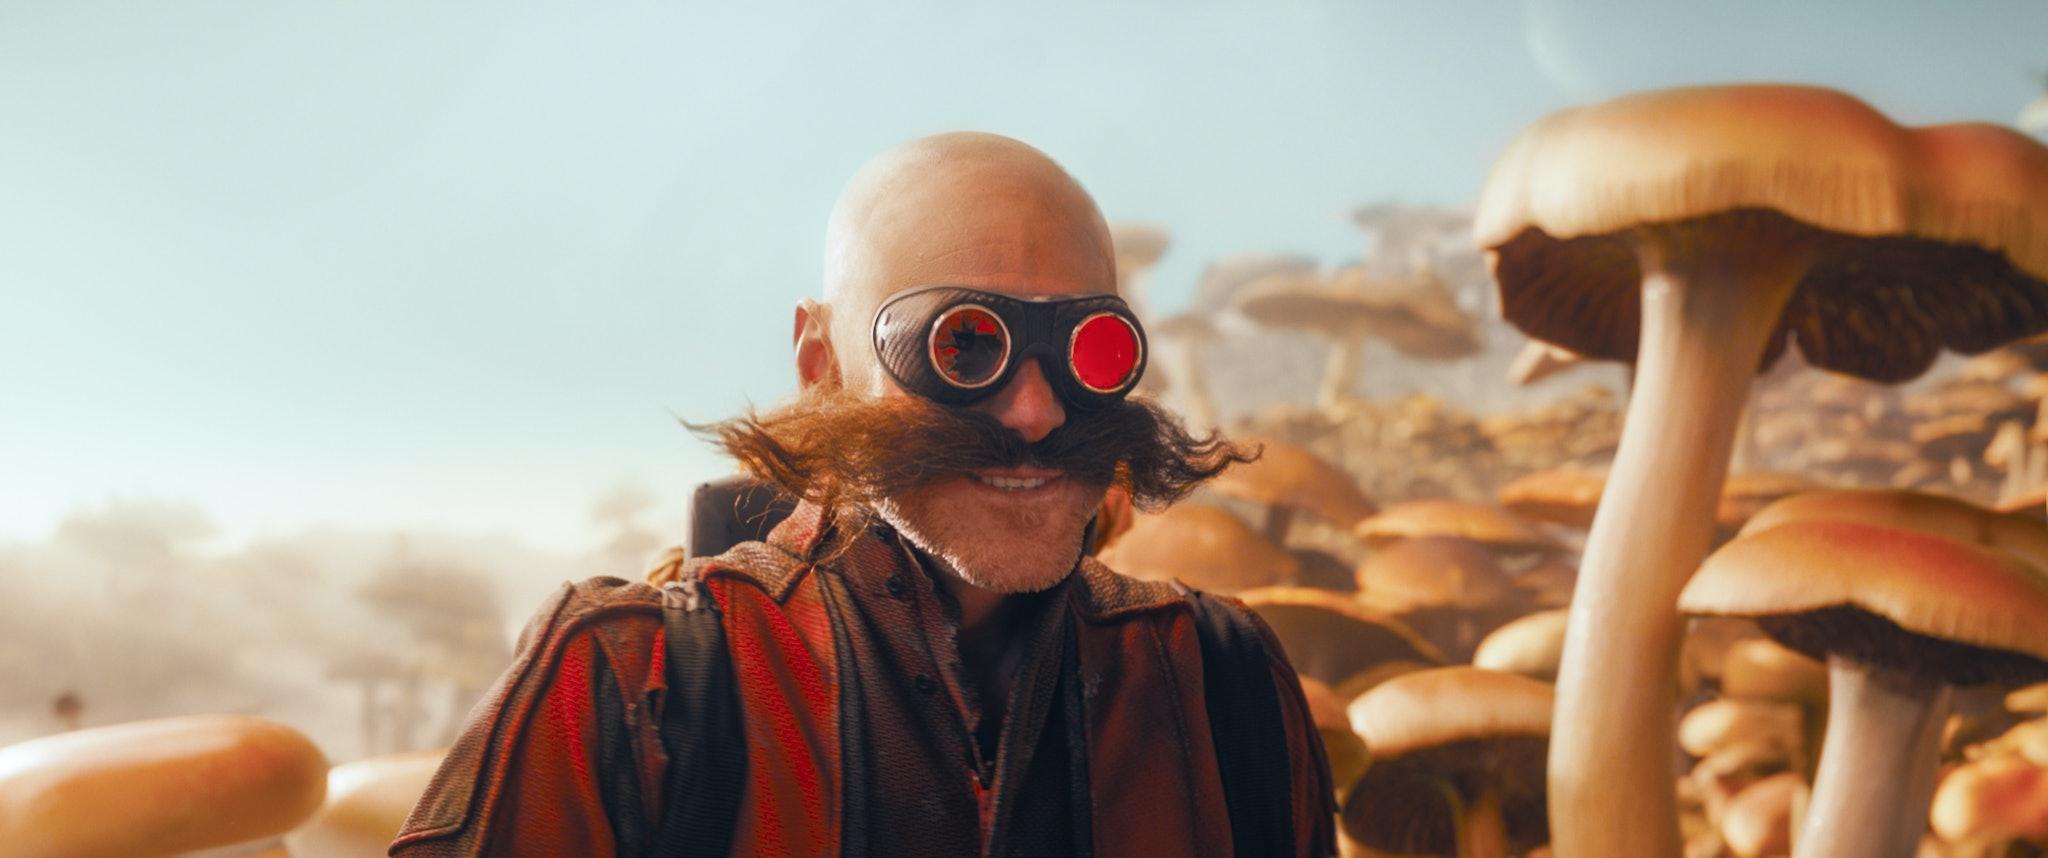 sonic the hedgehog 2 movie 2022 trailer